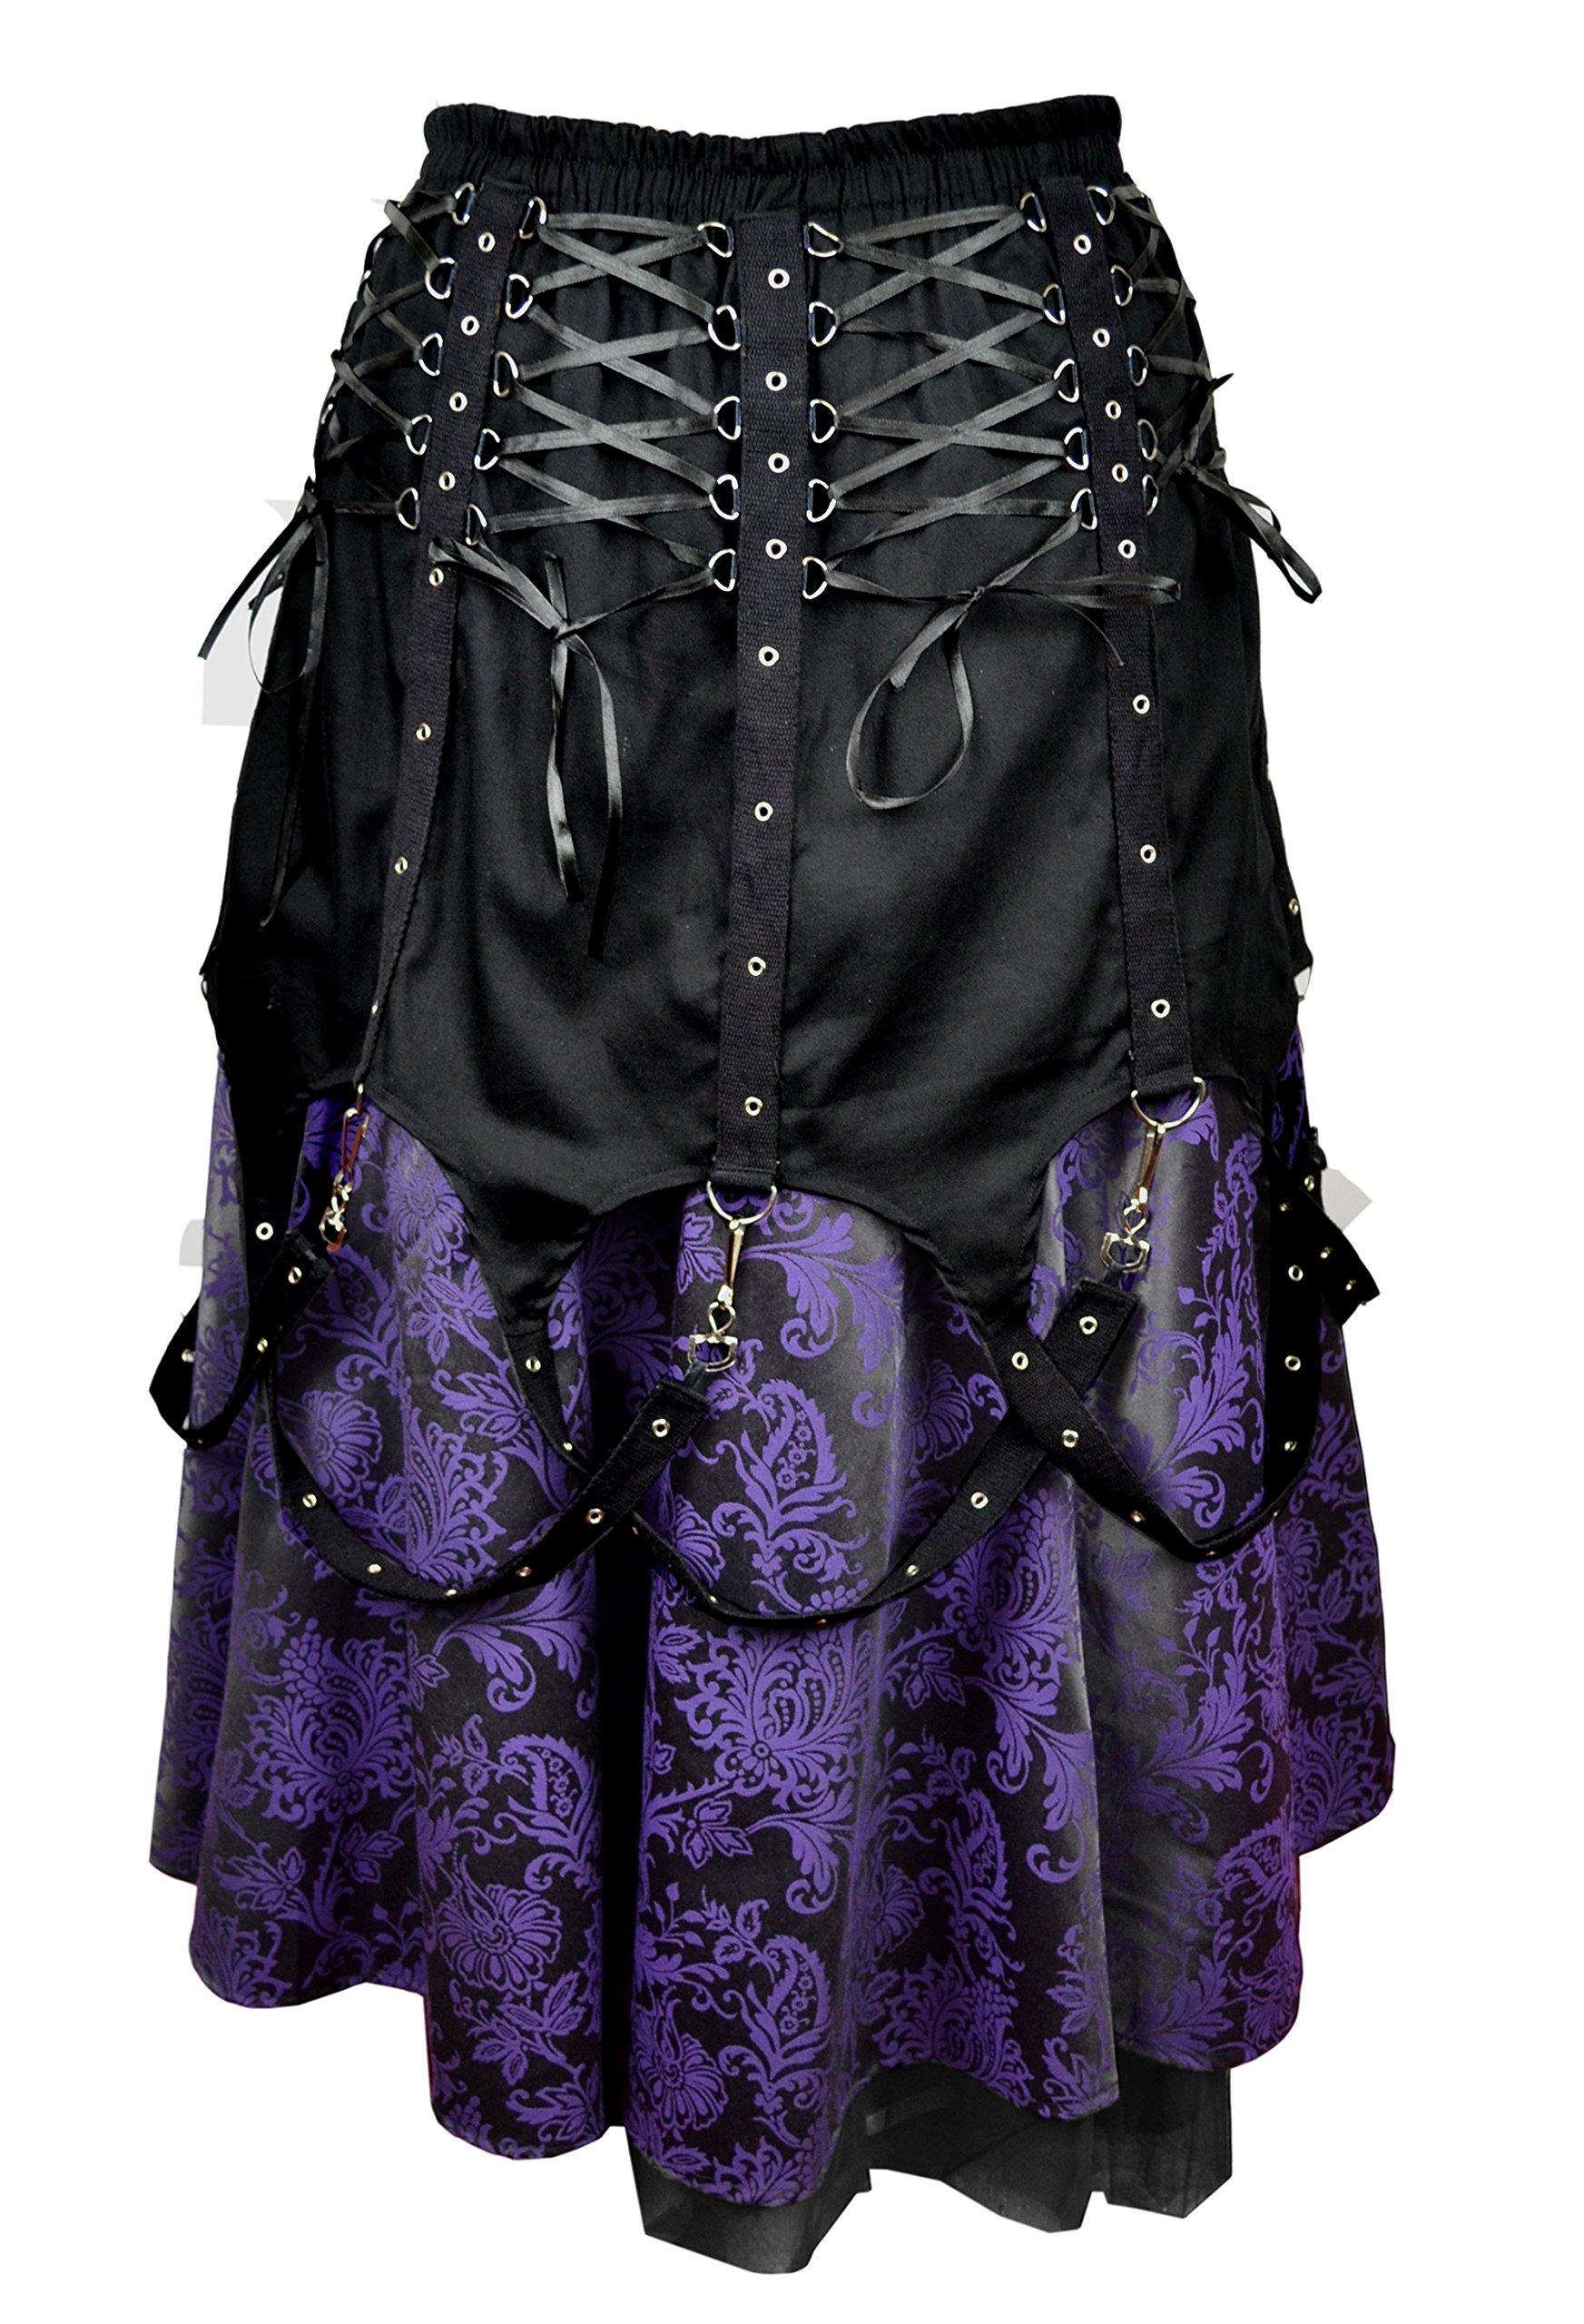 Dark Star Black Purple Brocade Gothic Medieval Punk Chains Long Skirt M-2X Plus Size